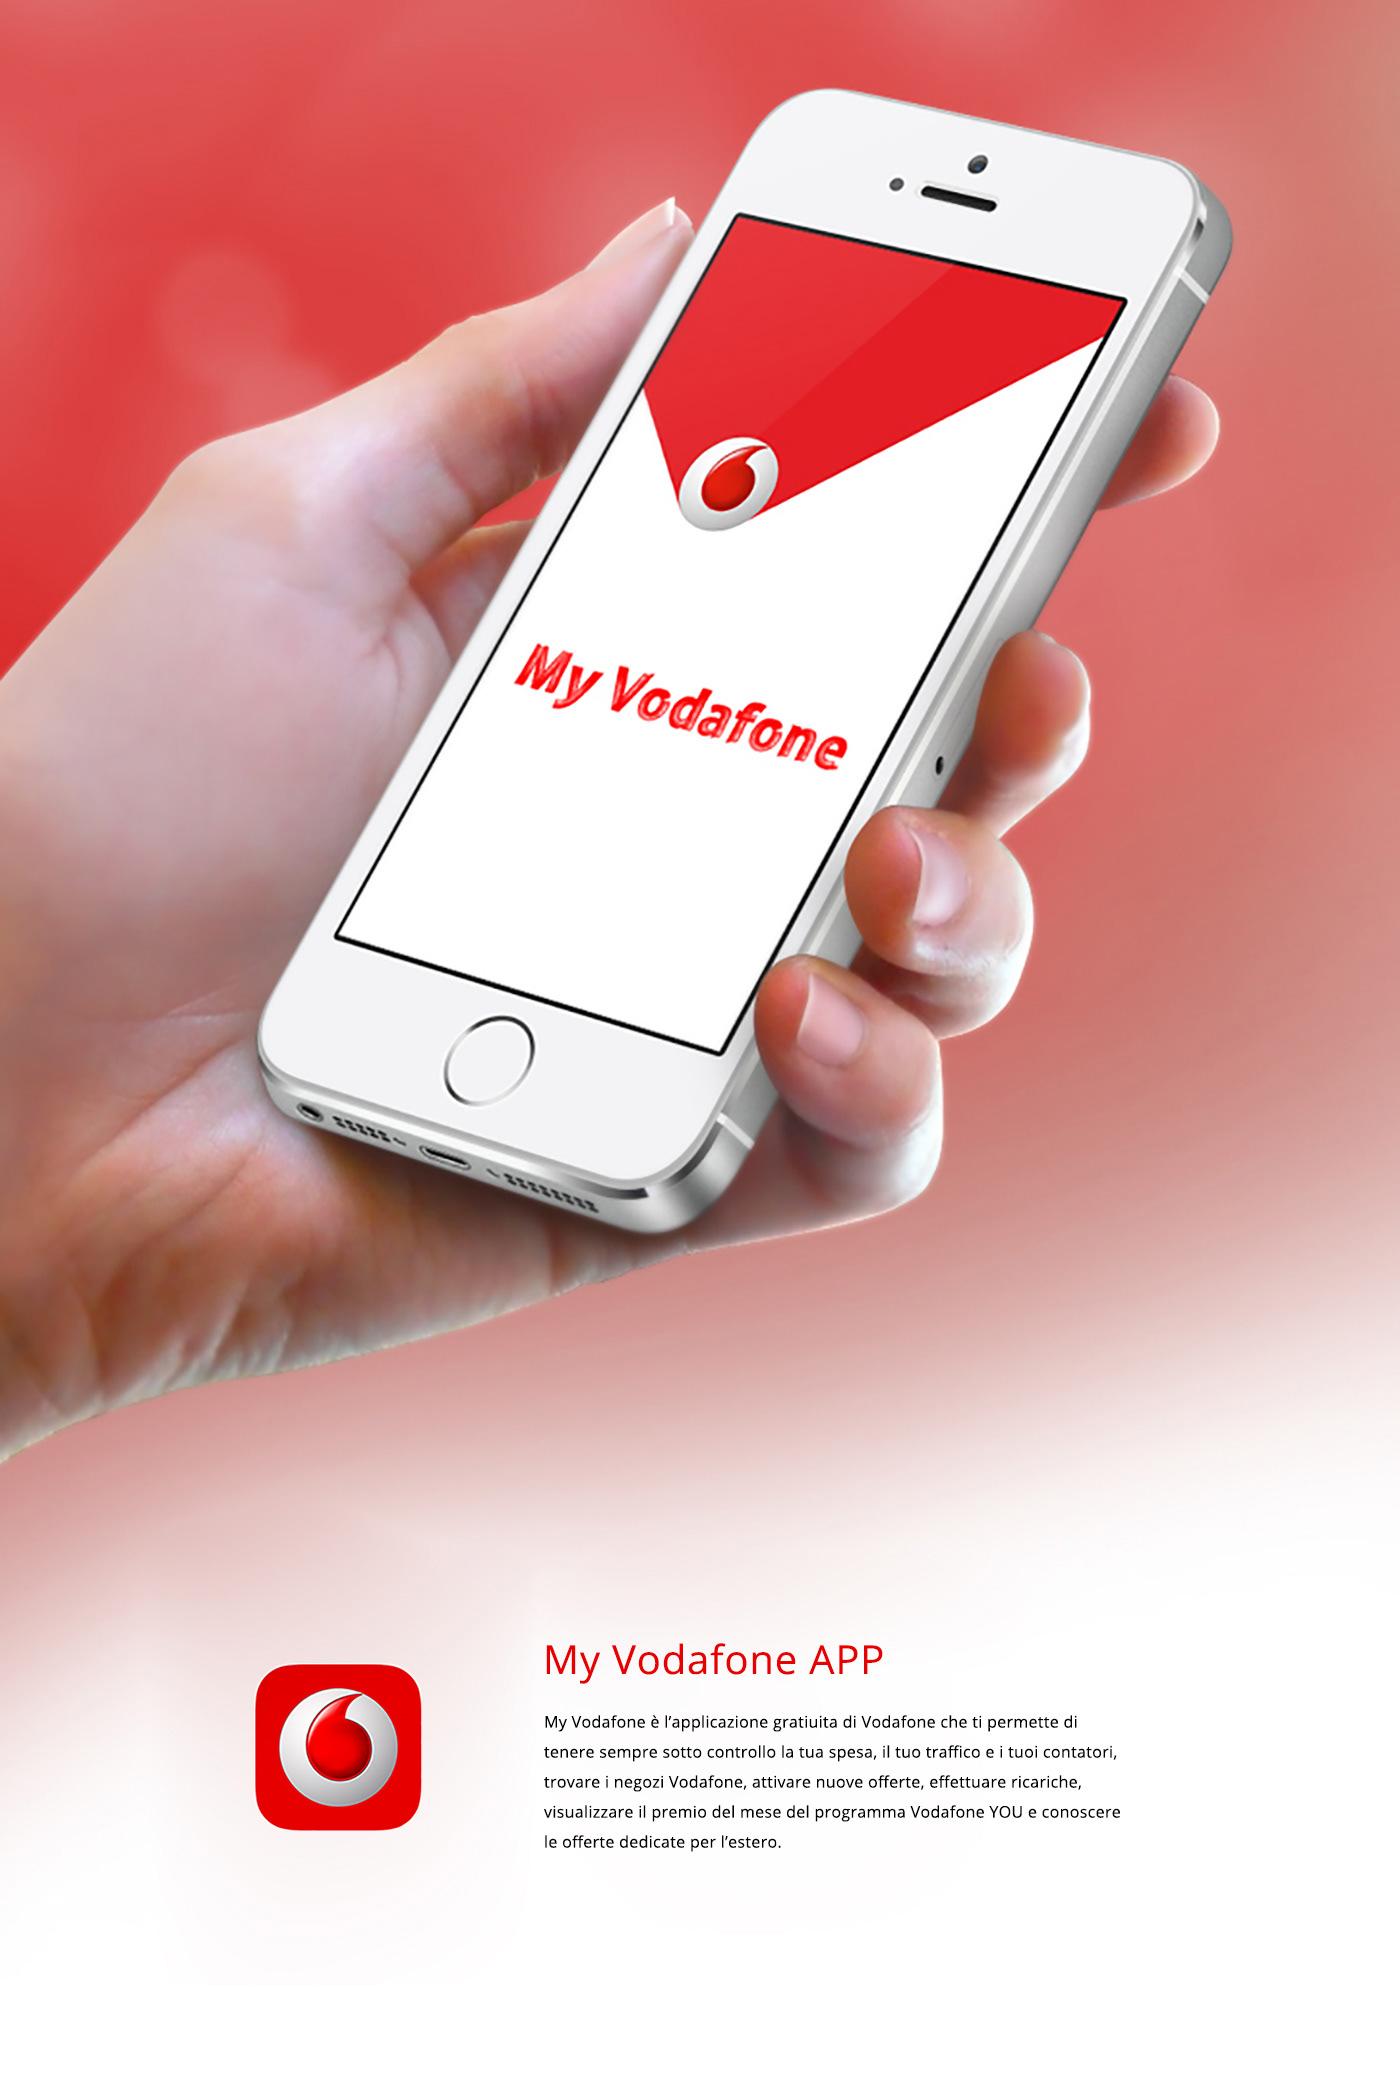 My Vodafone IT